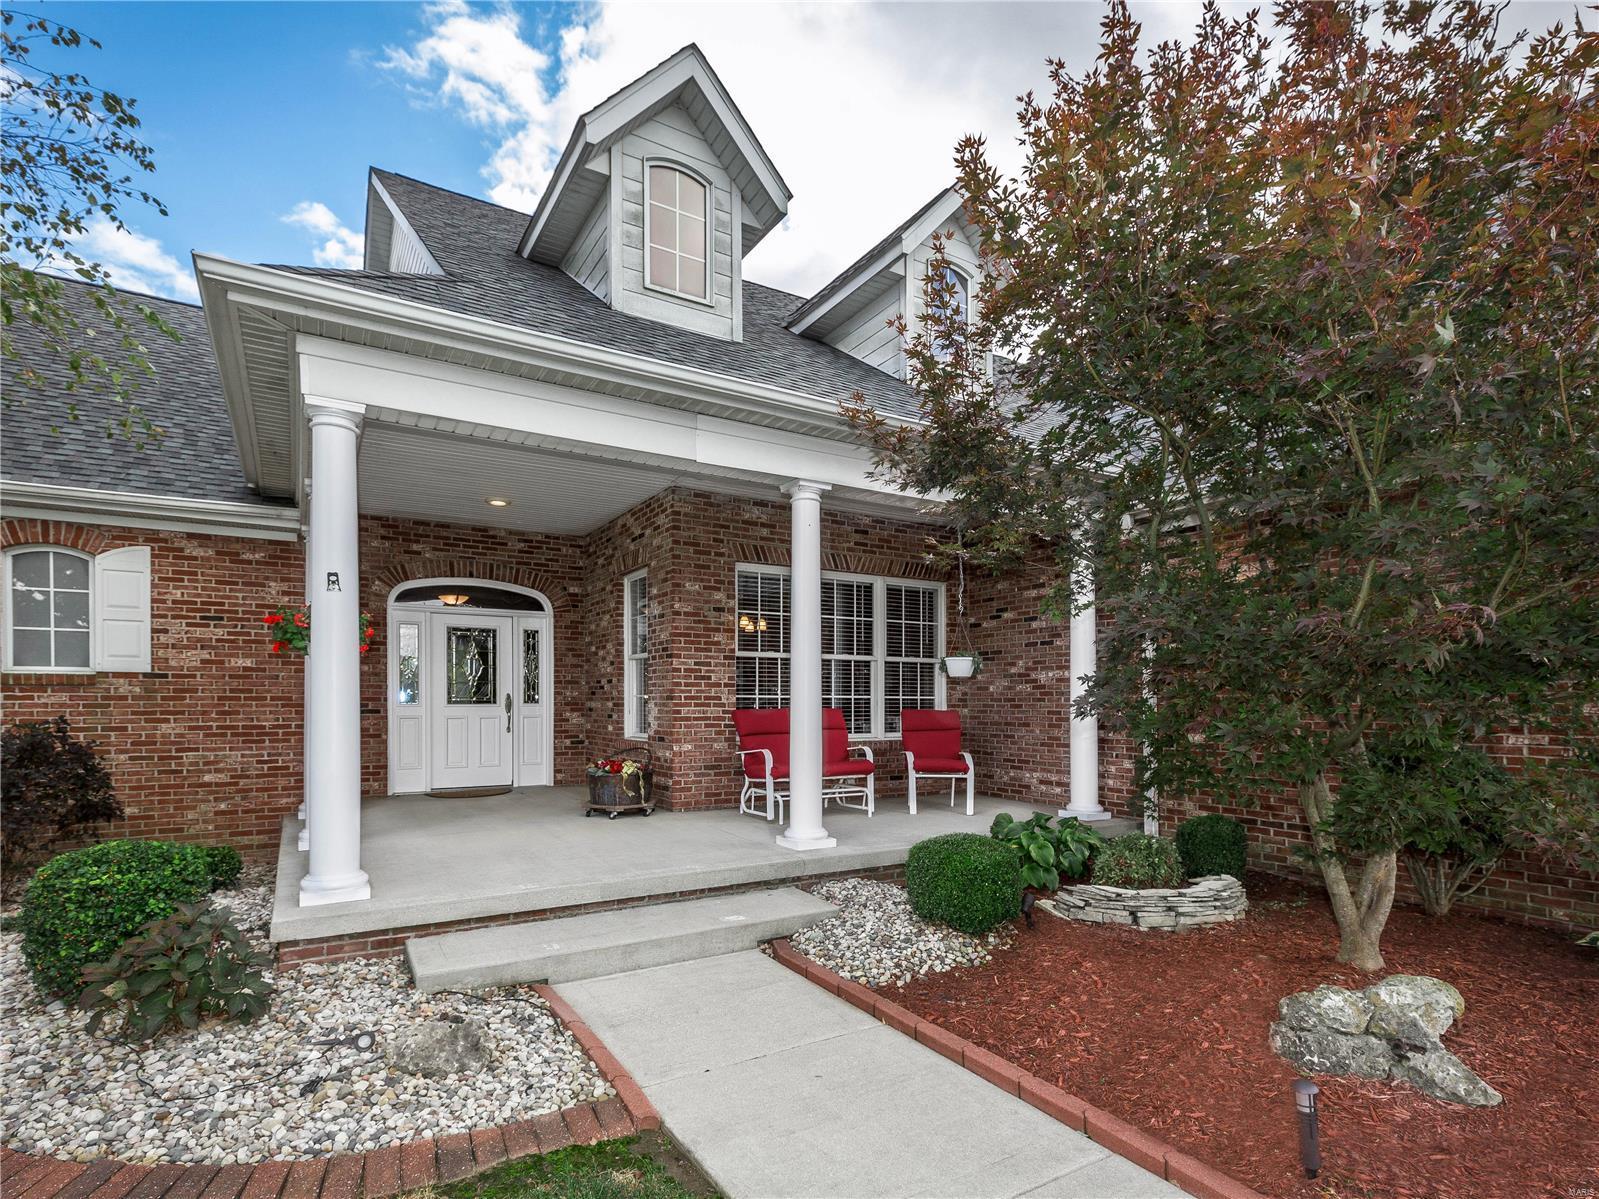 108 Verrazanno Property Photo - Highland, IL real estate listing